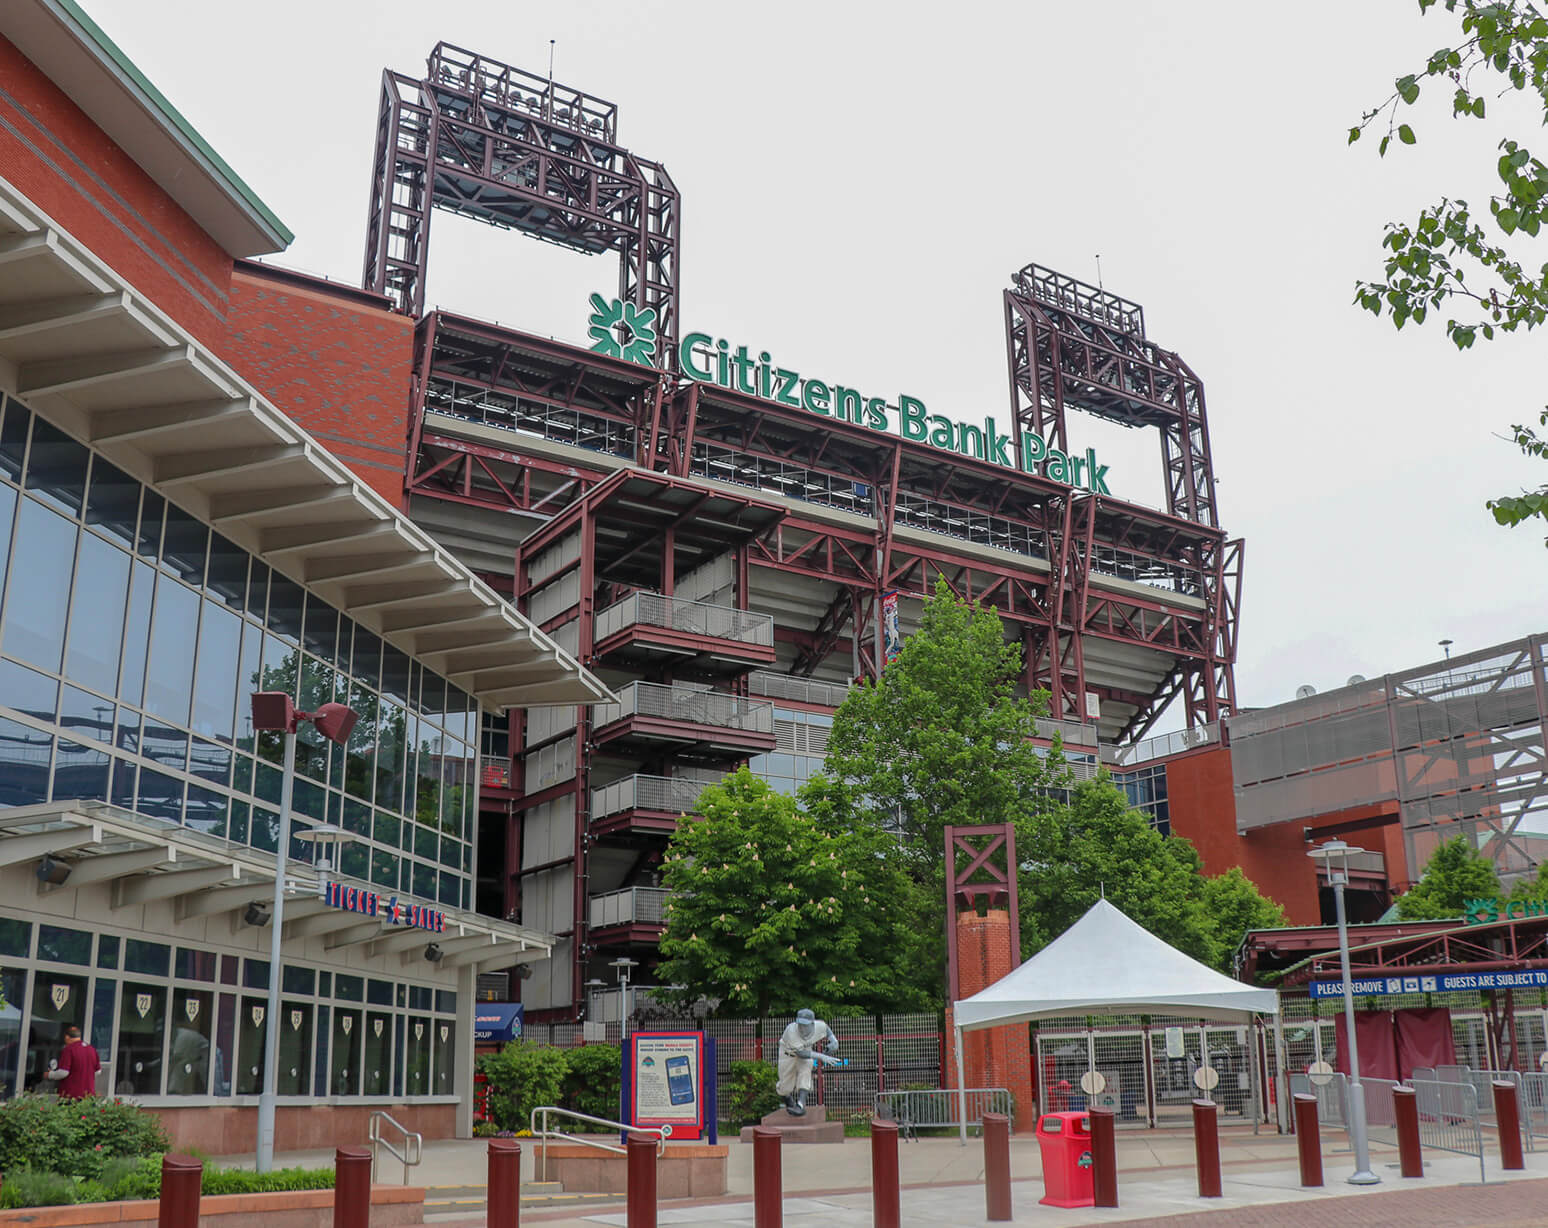 Where do the Philadelphia Eagles play baseball?